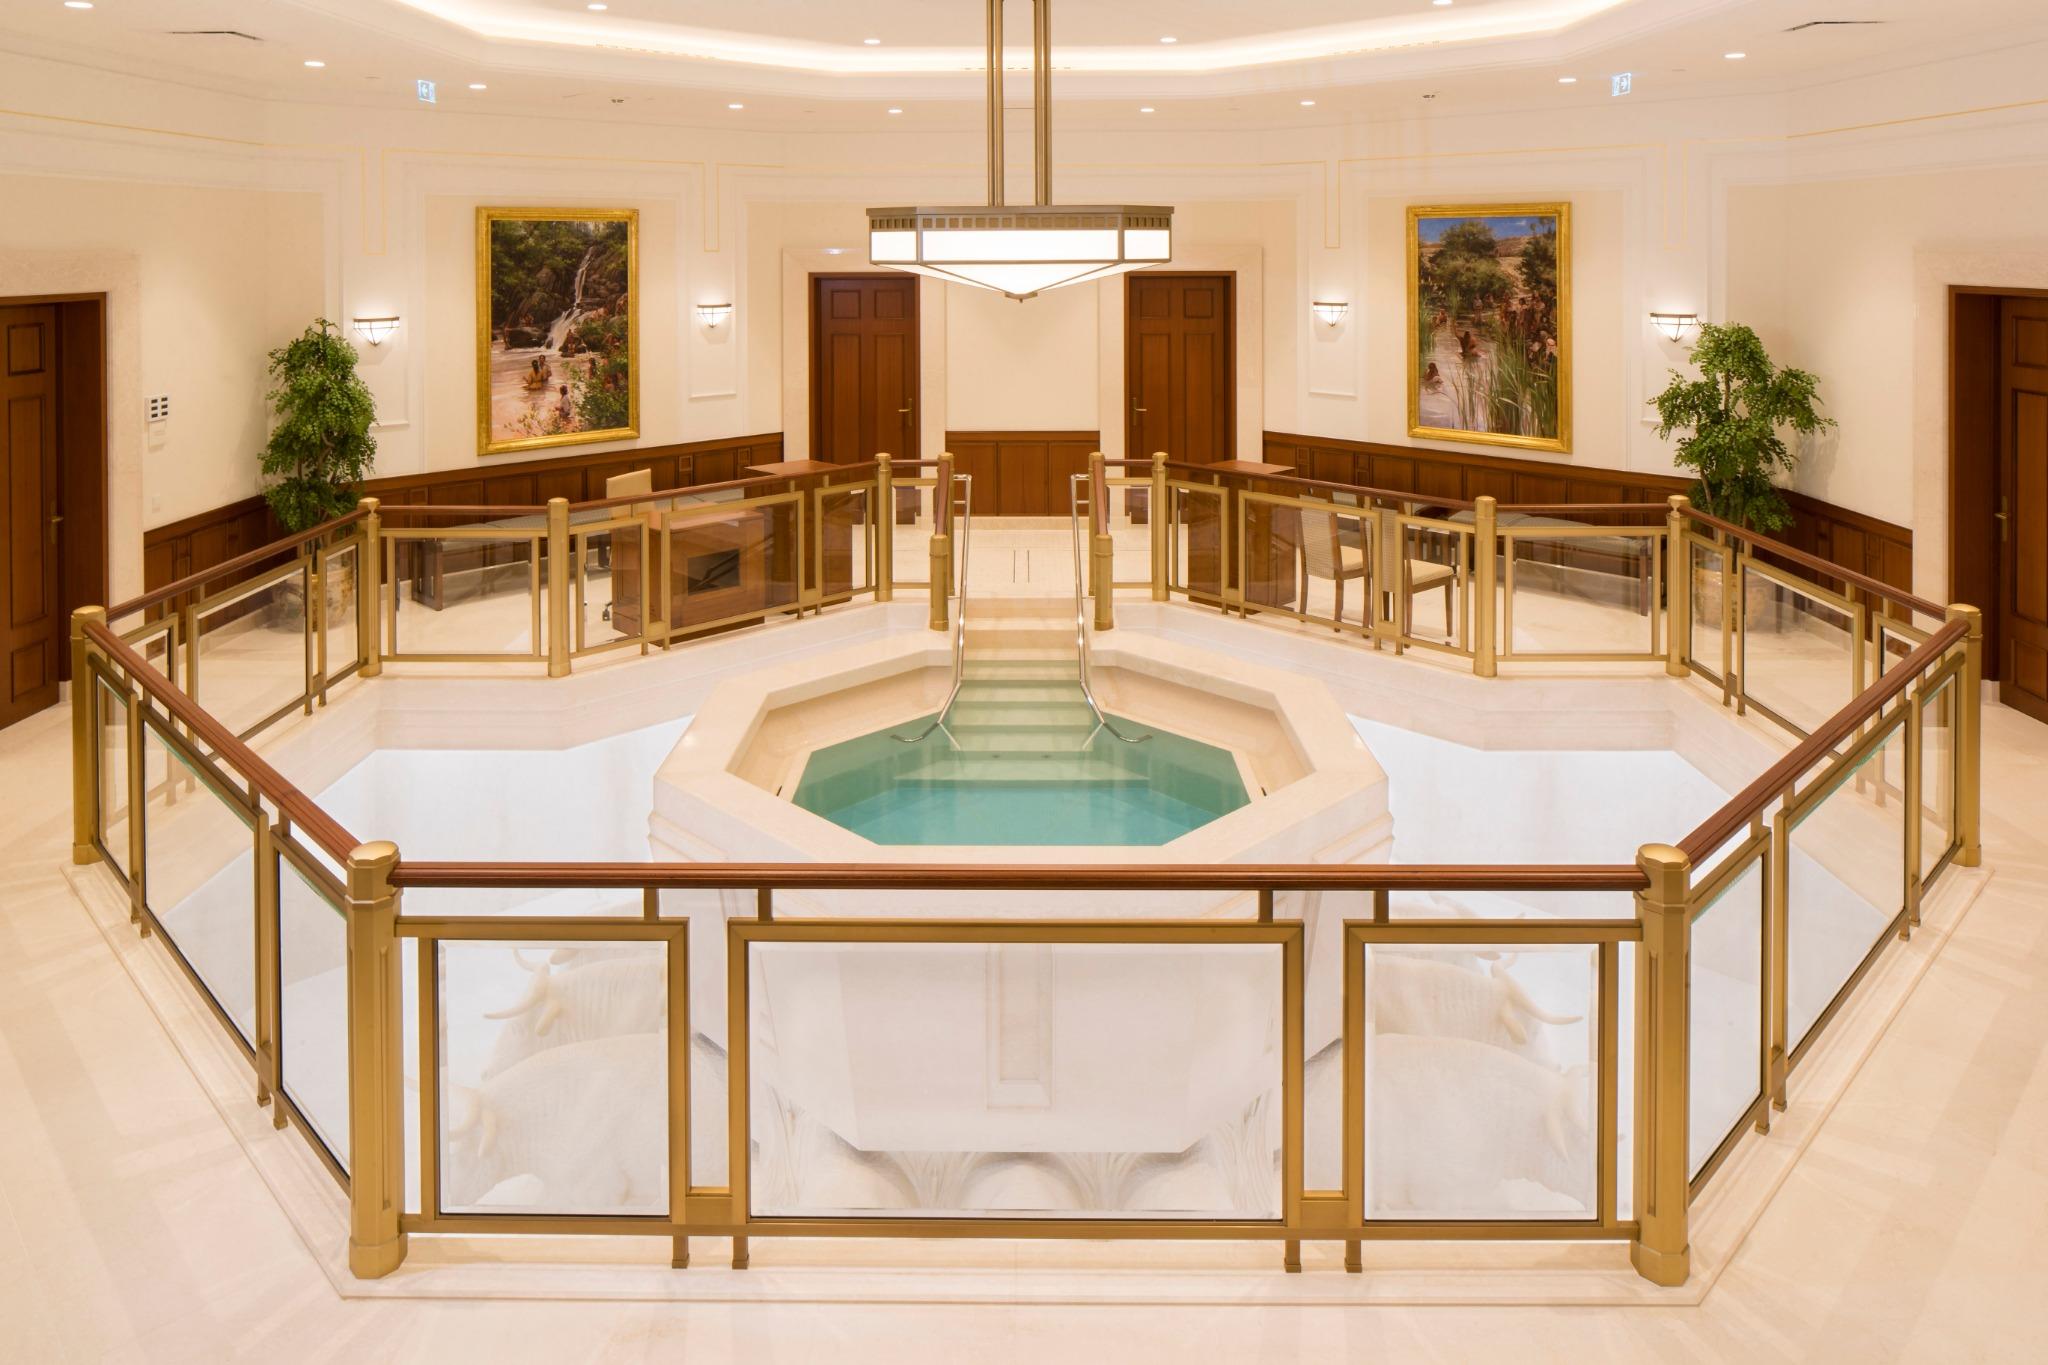 Batistério do Templo de Frankfurt Alemanha.